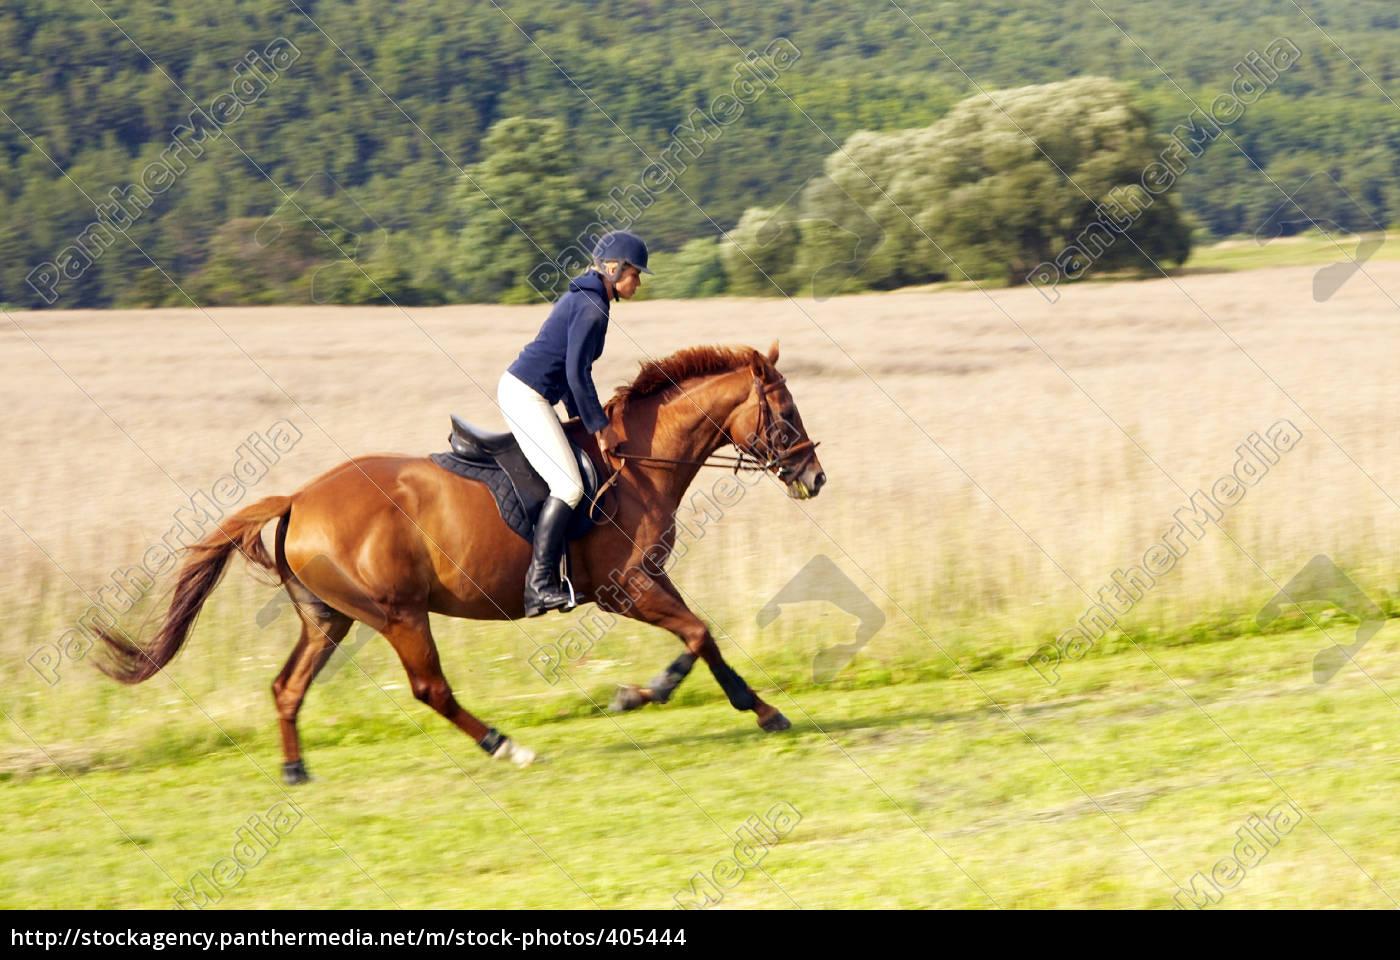 sunday, afternoon, ride, horse, iii - 405444